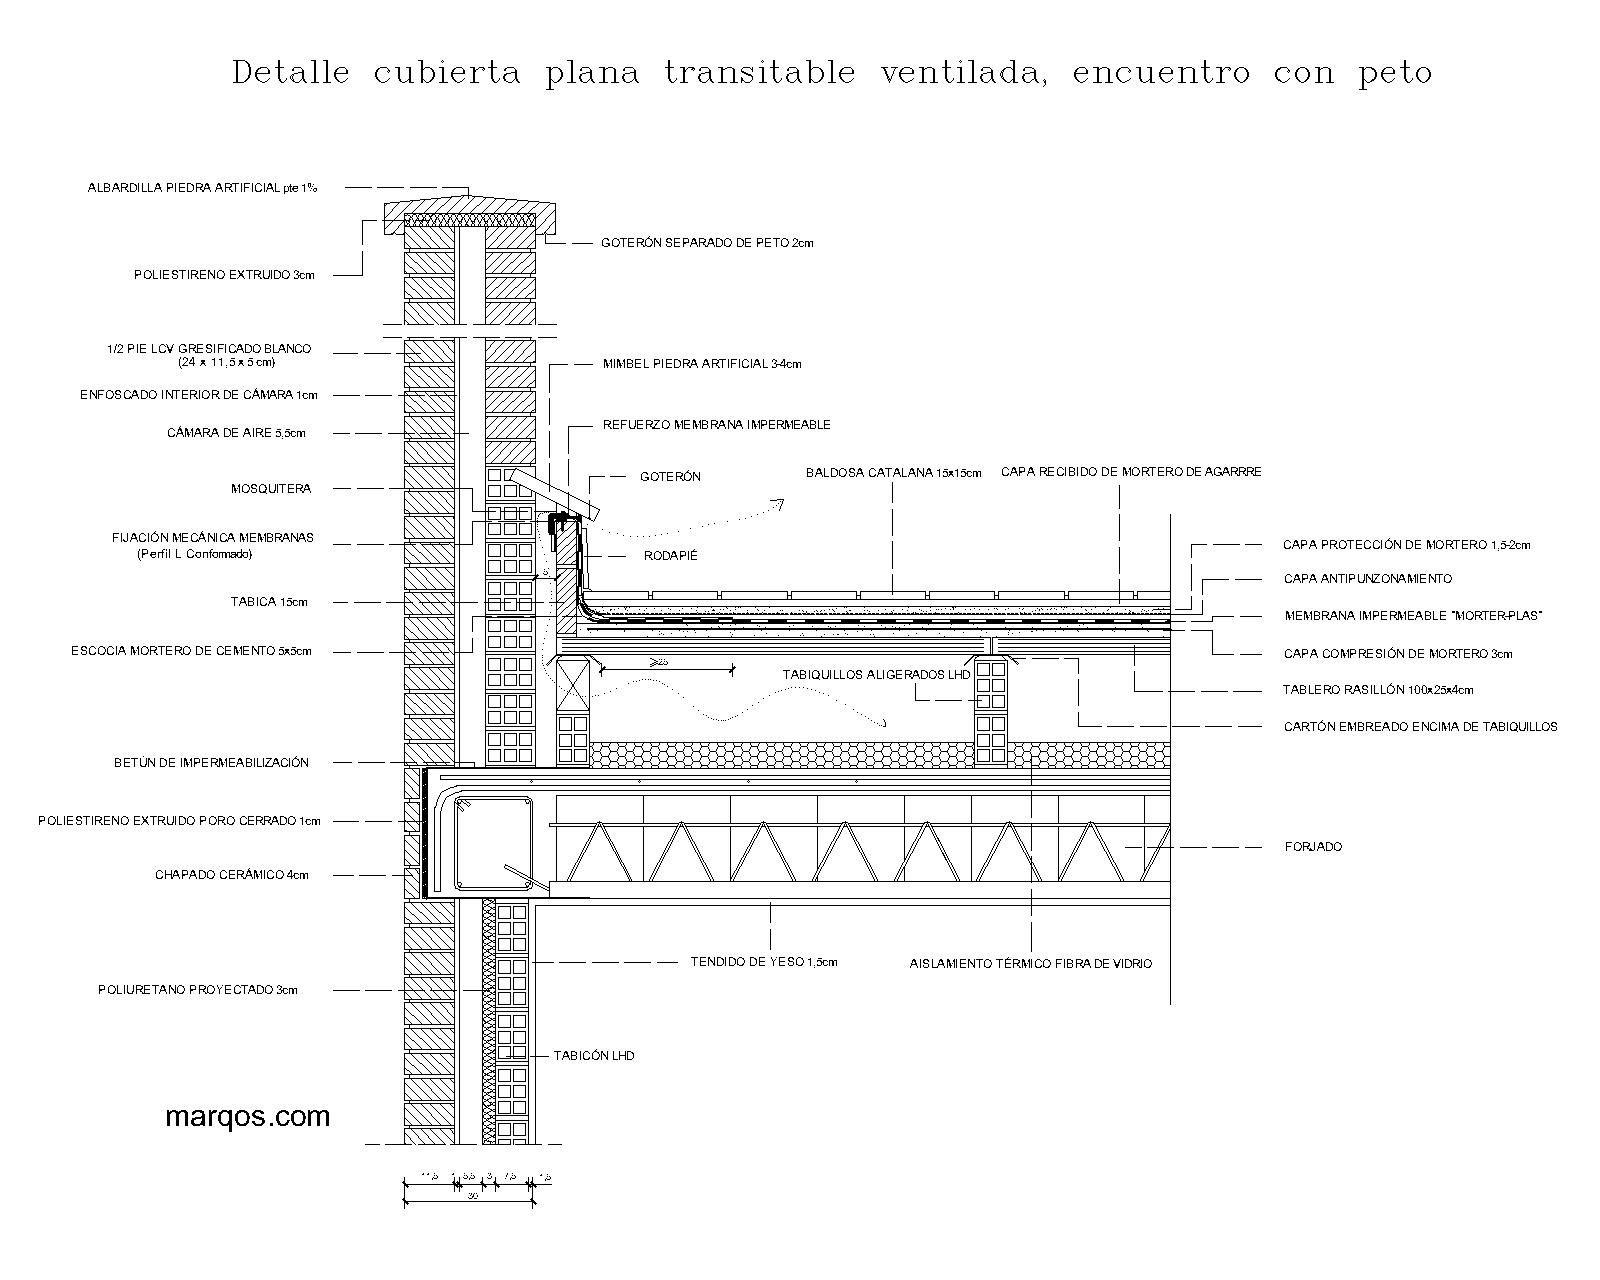 Cubierta plana transitable ventilada for Piso tecnico detalle